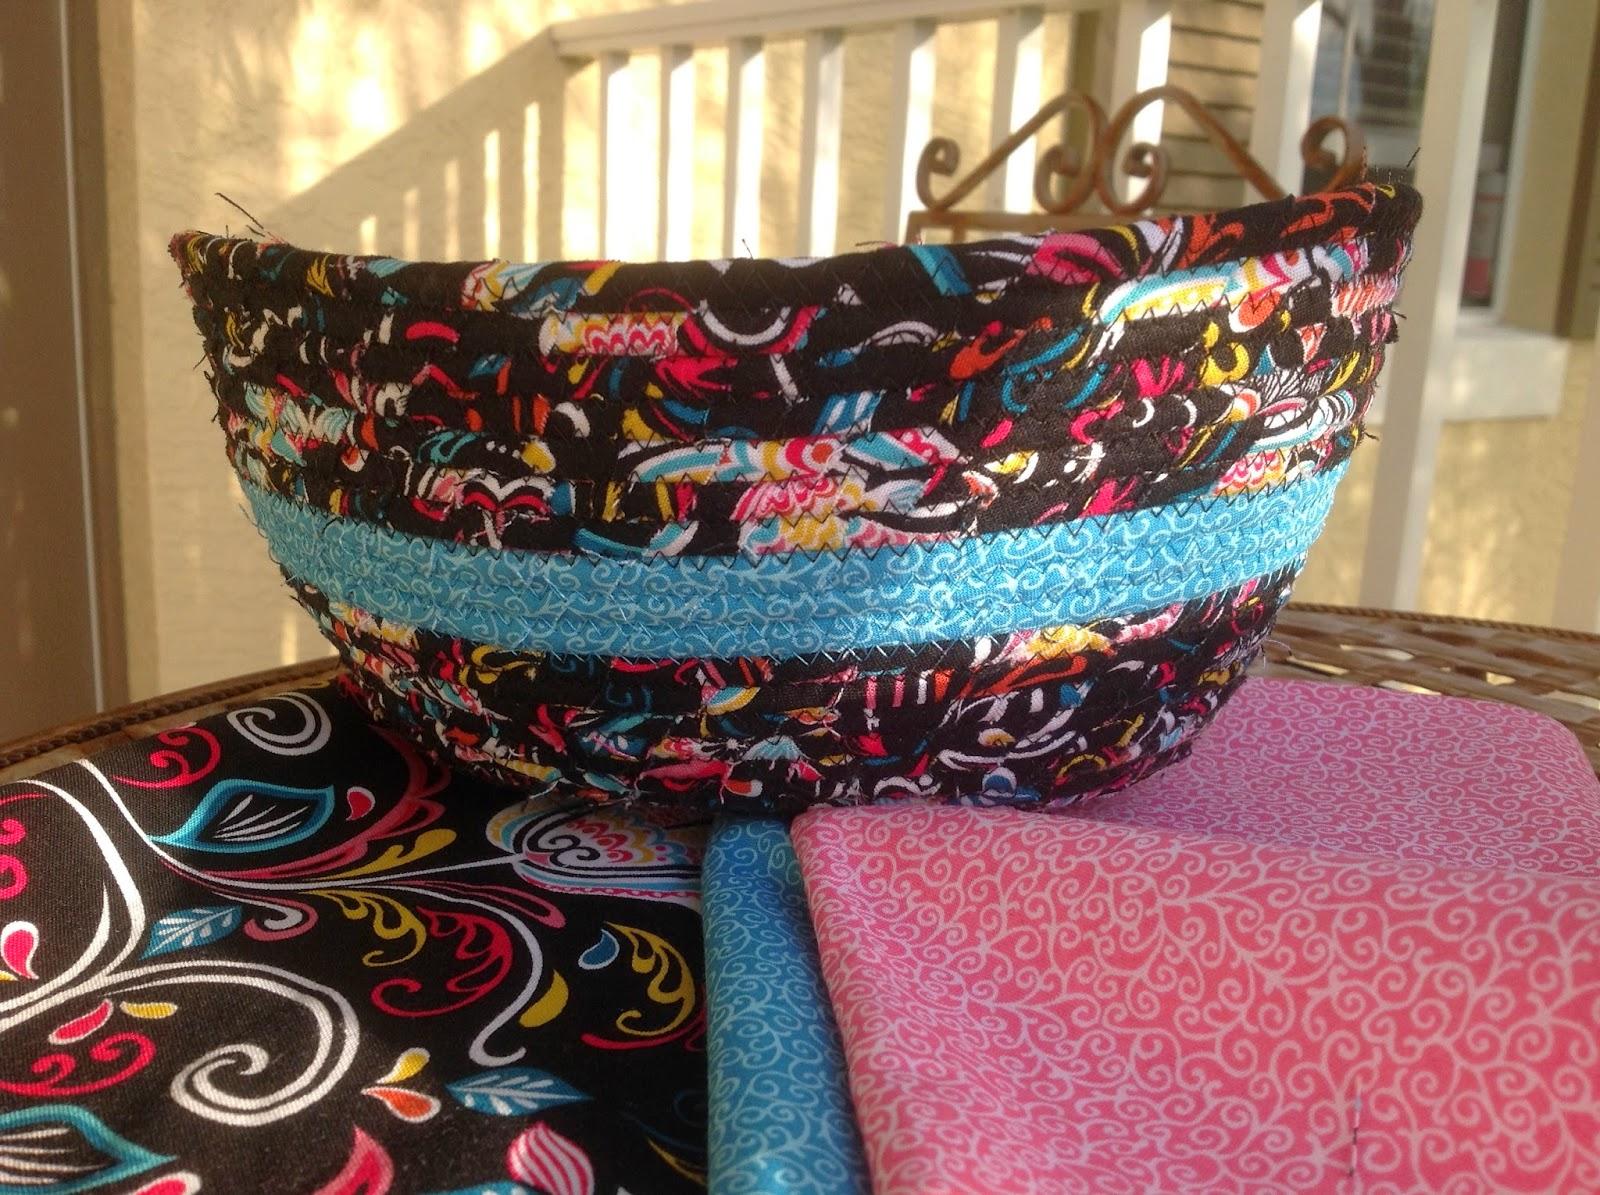 http://musingsofamenopausalmelon.blogspot.com/2014/02/another-fabric-bowl.html